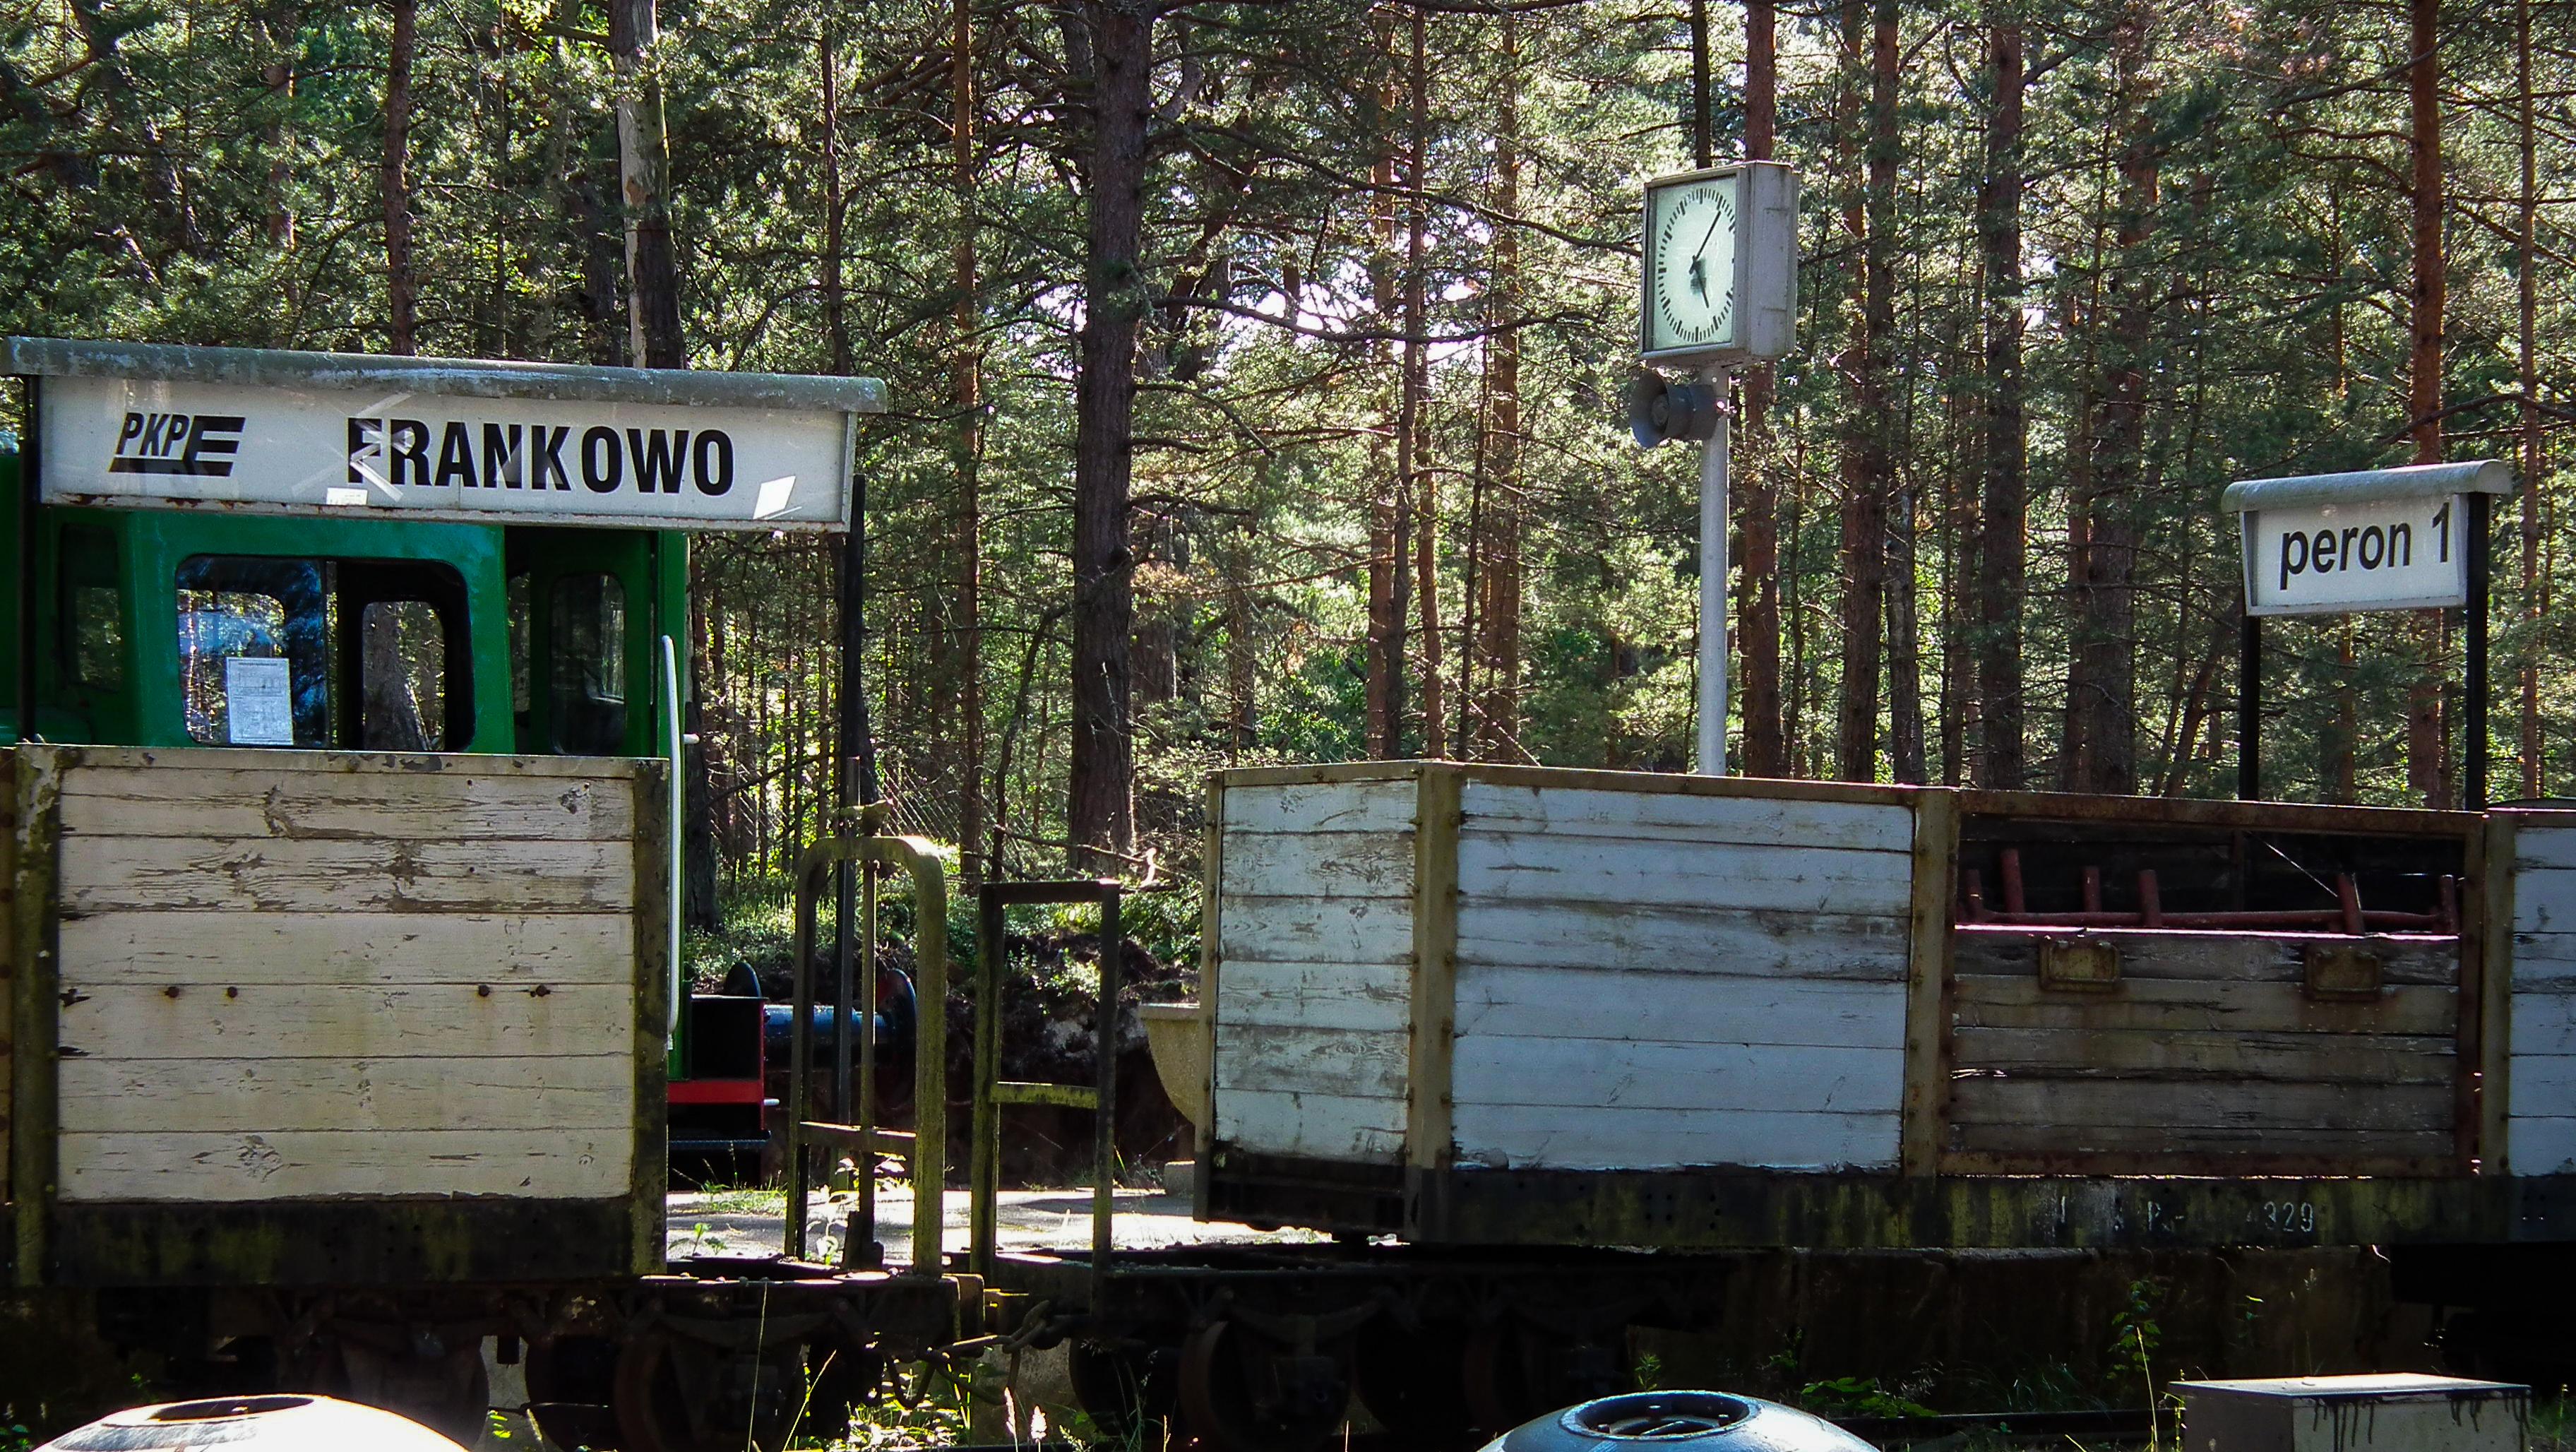 Helska Kolej Wąskotorowa